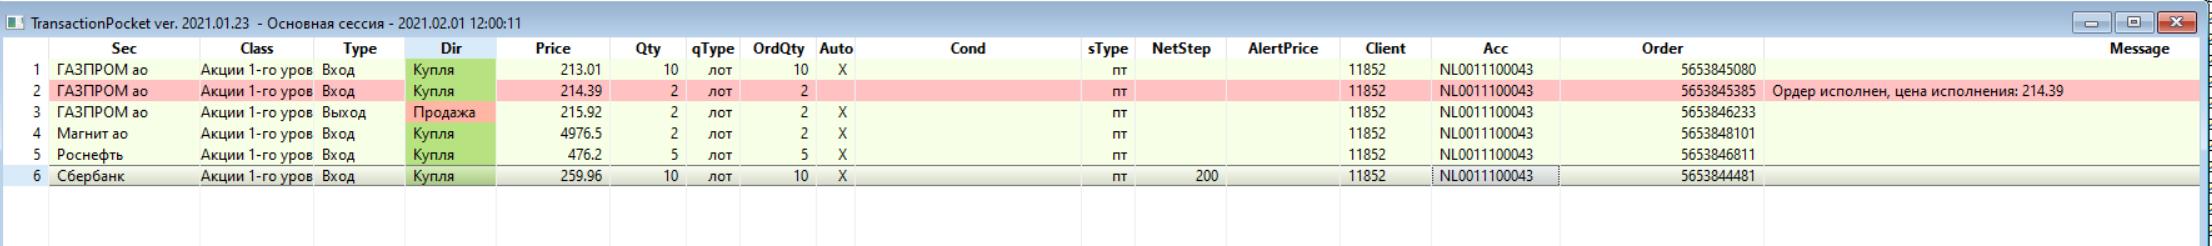 Карман-сделок-transactionPocket-окно-скрипта-акции